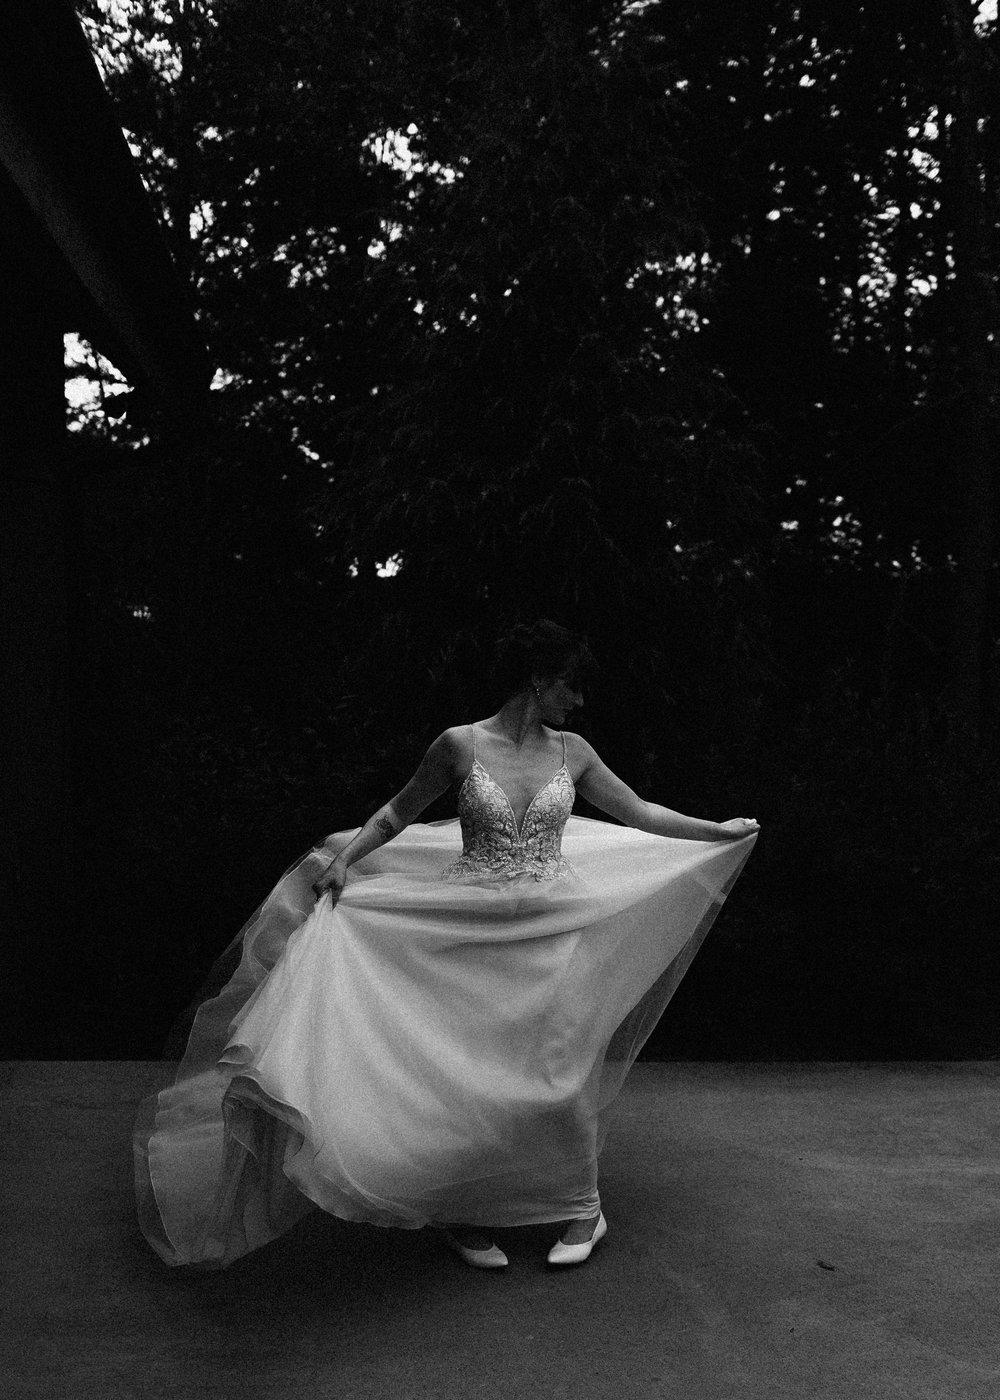 dahlonega_juliette_chapel_photojournalism_atlanta_wedding_photographers_1307.jpg